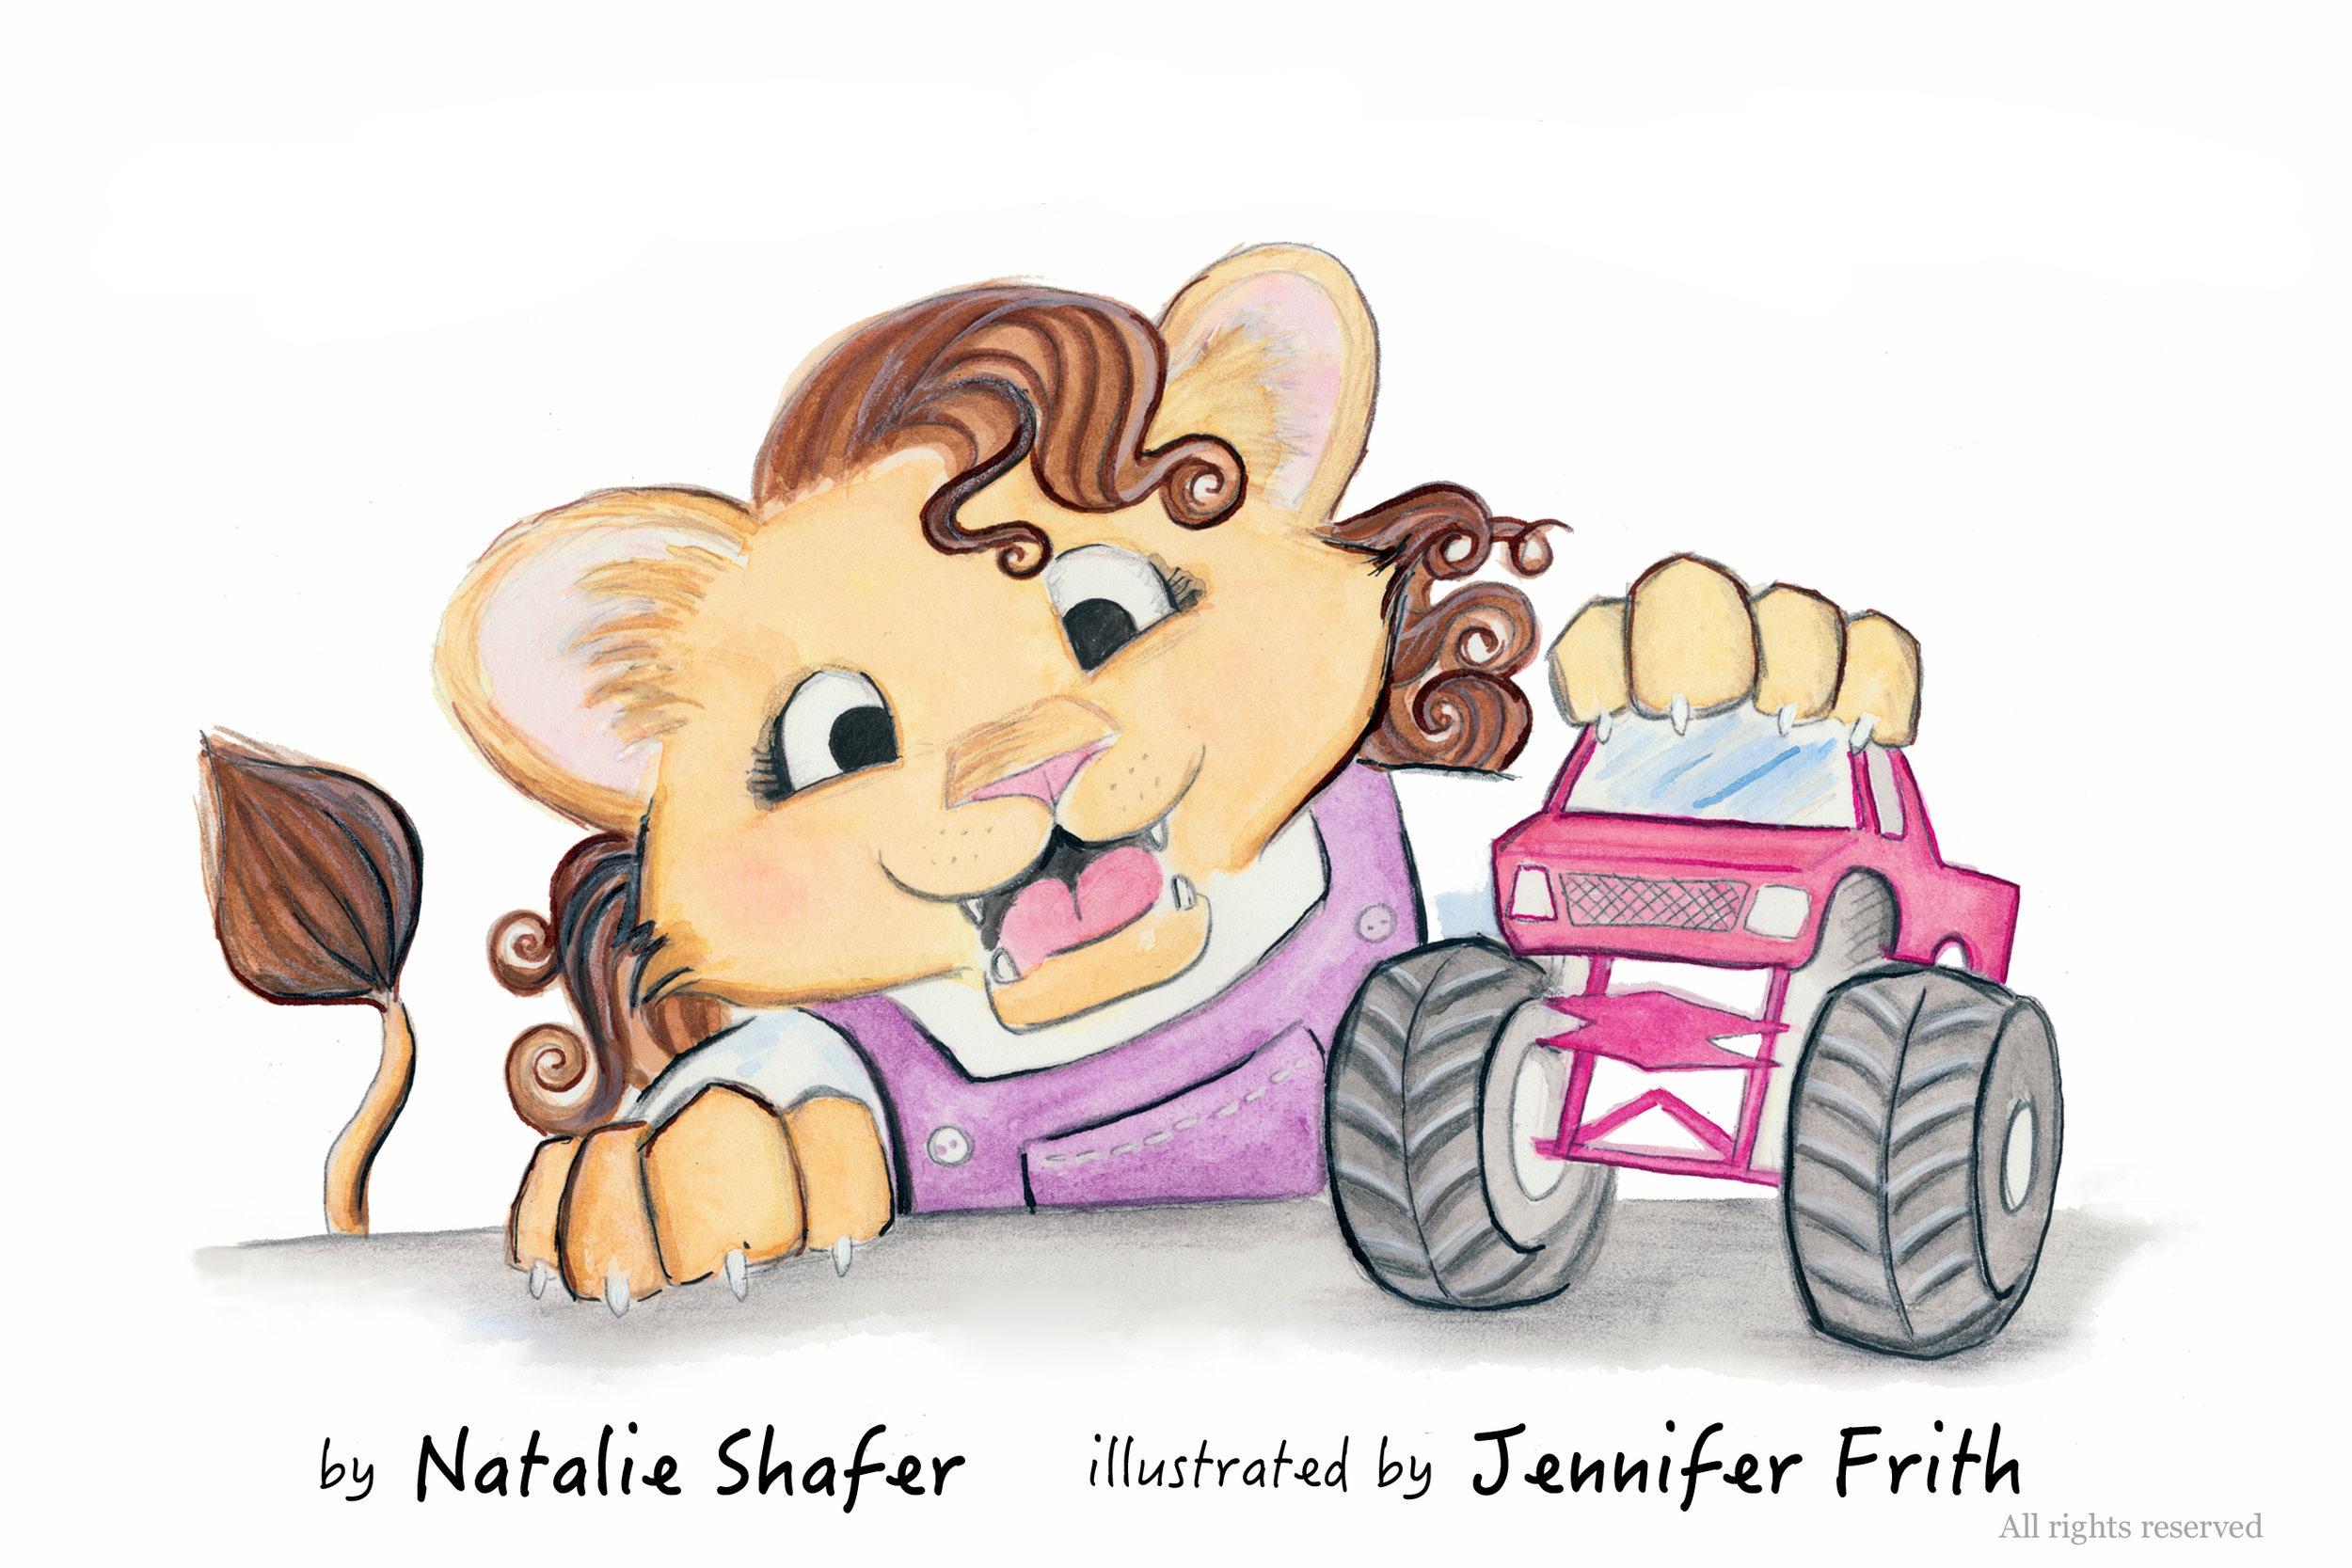 Maggie Likes Monster Trucks - Written by Natalie Shafer. Illustrated by Jennifer Frith.